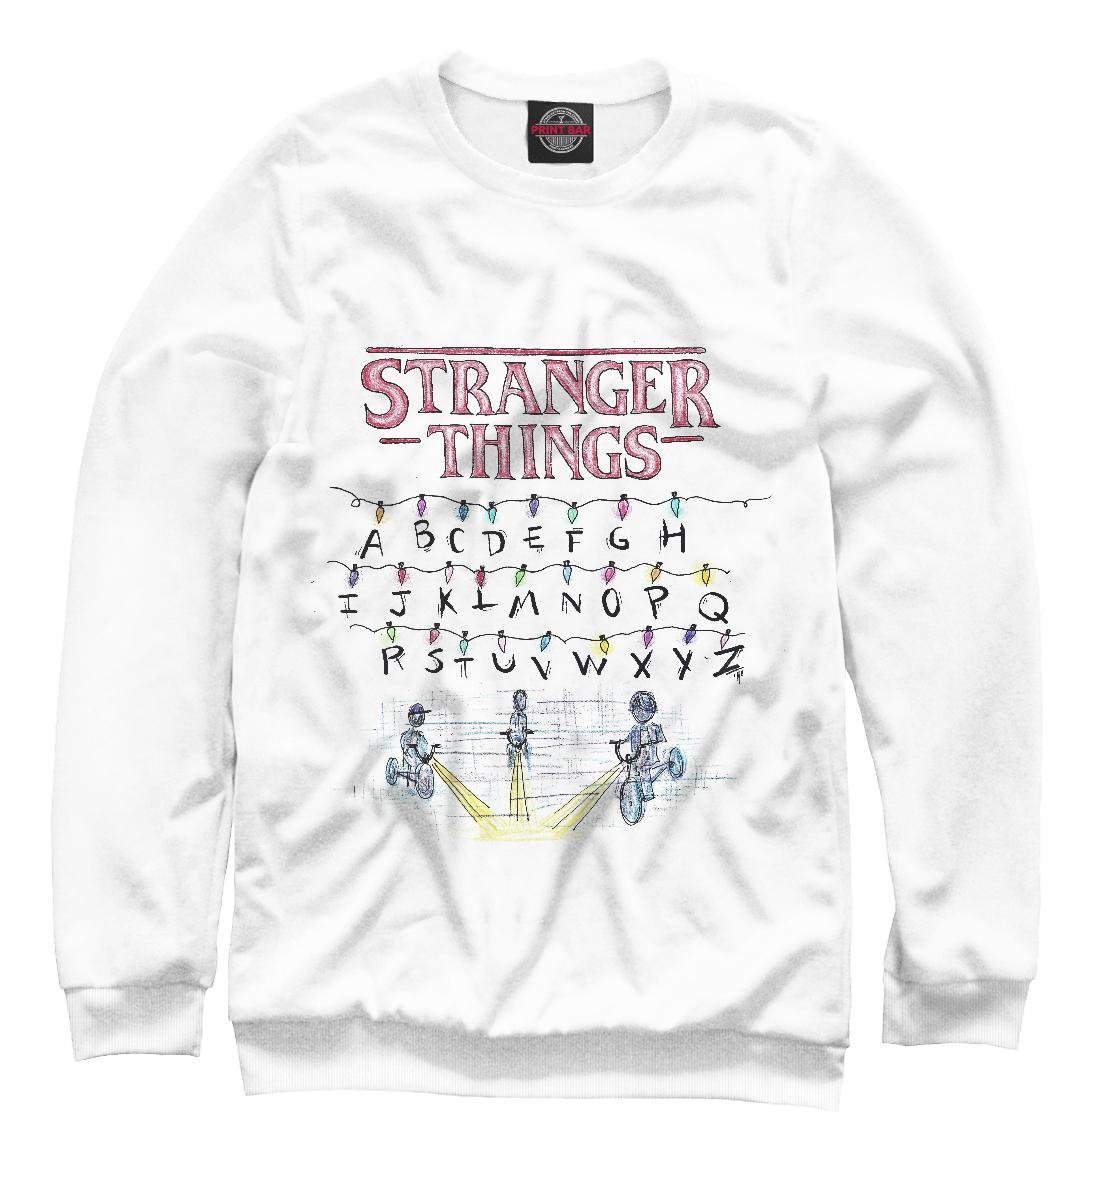 Купить Stranger Things, Printbar, Свитшоты, SOT-974911-swi-2